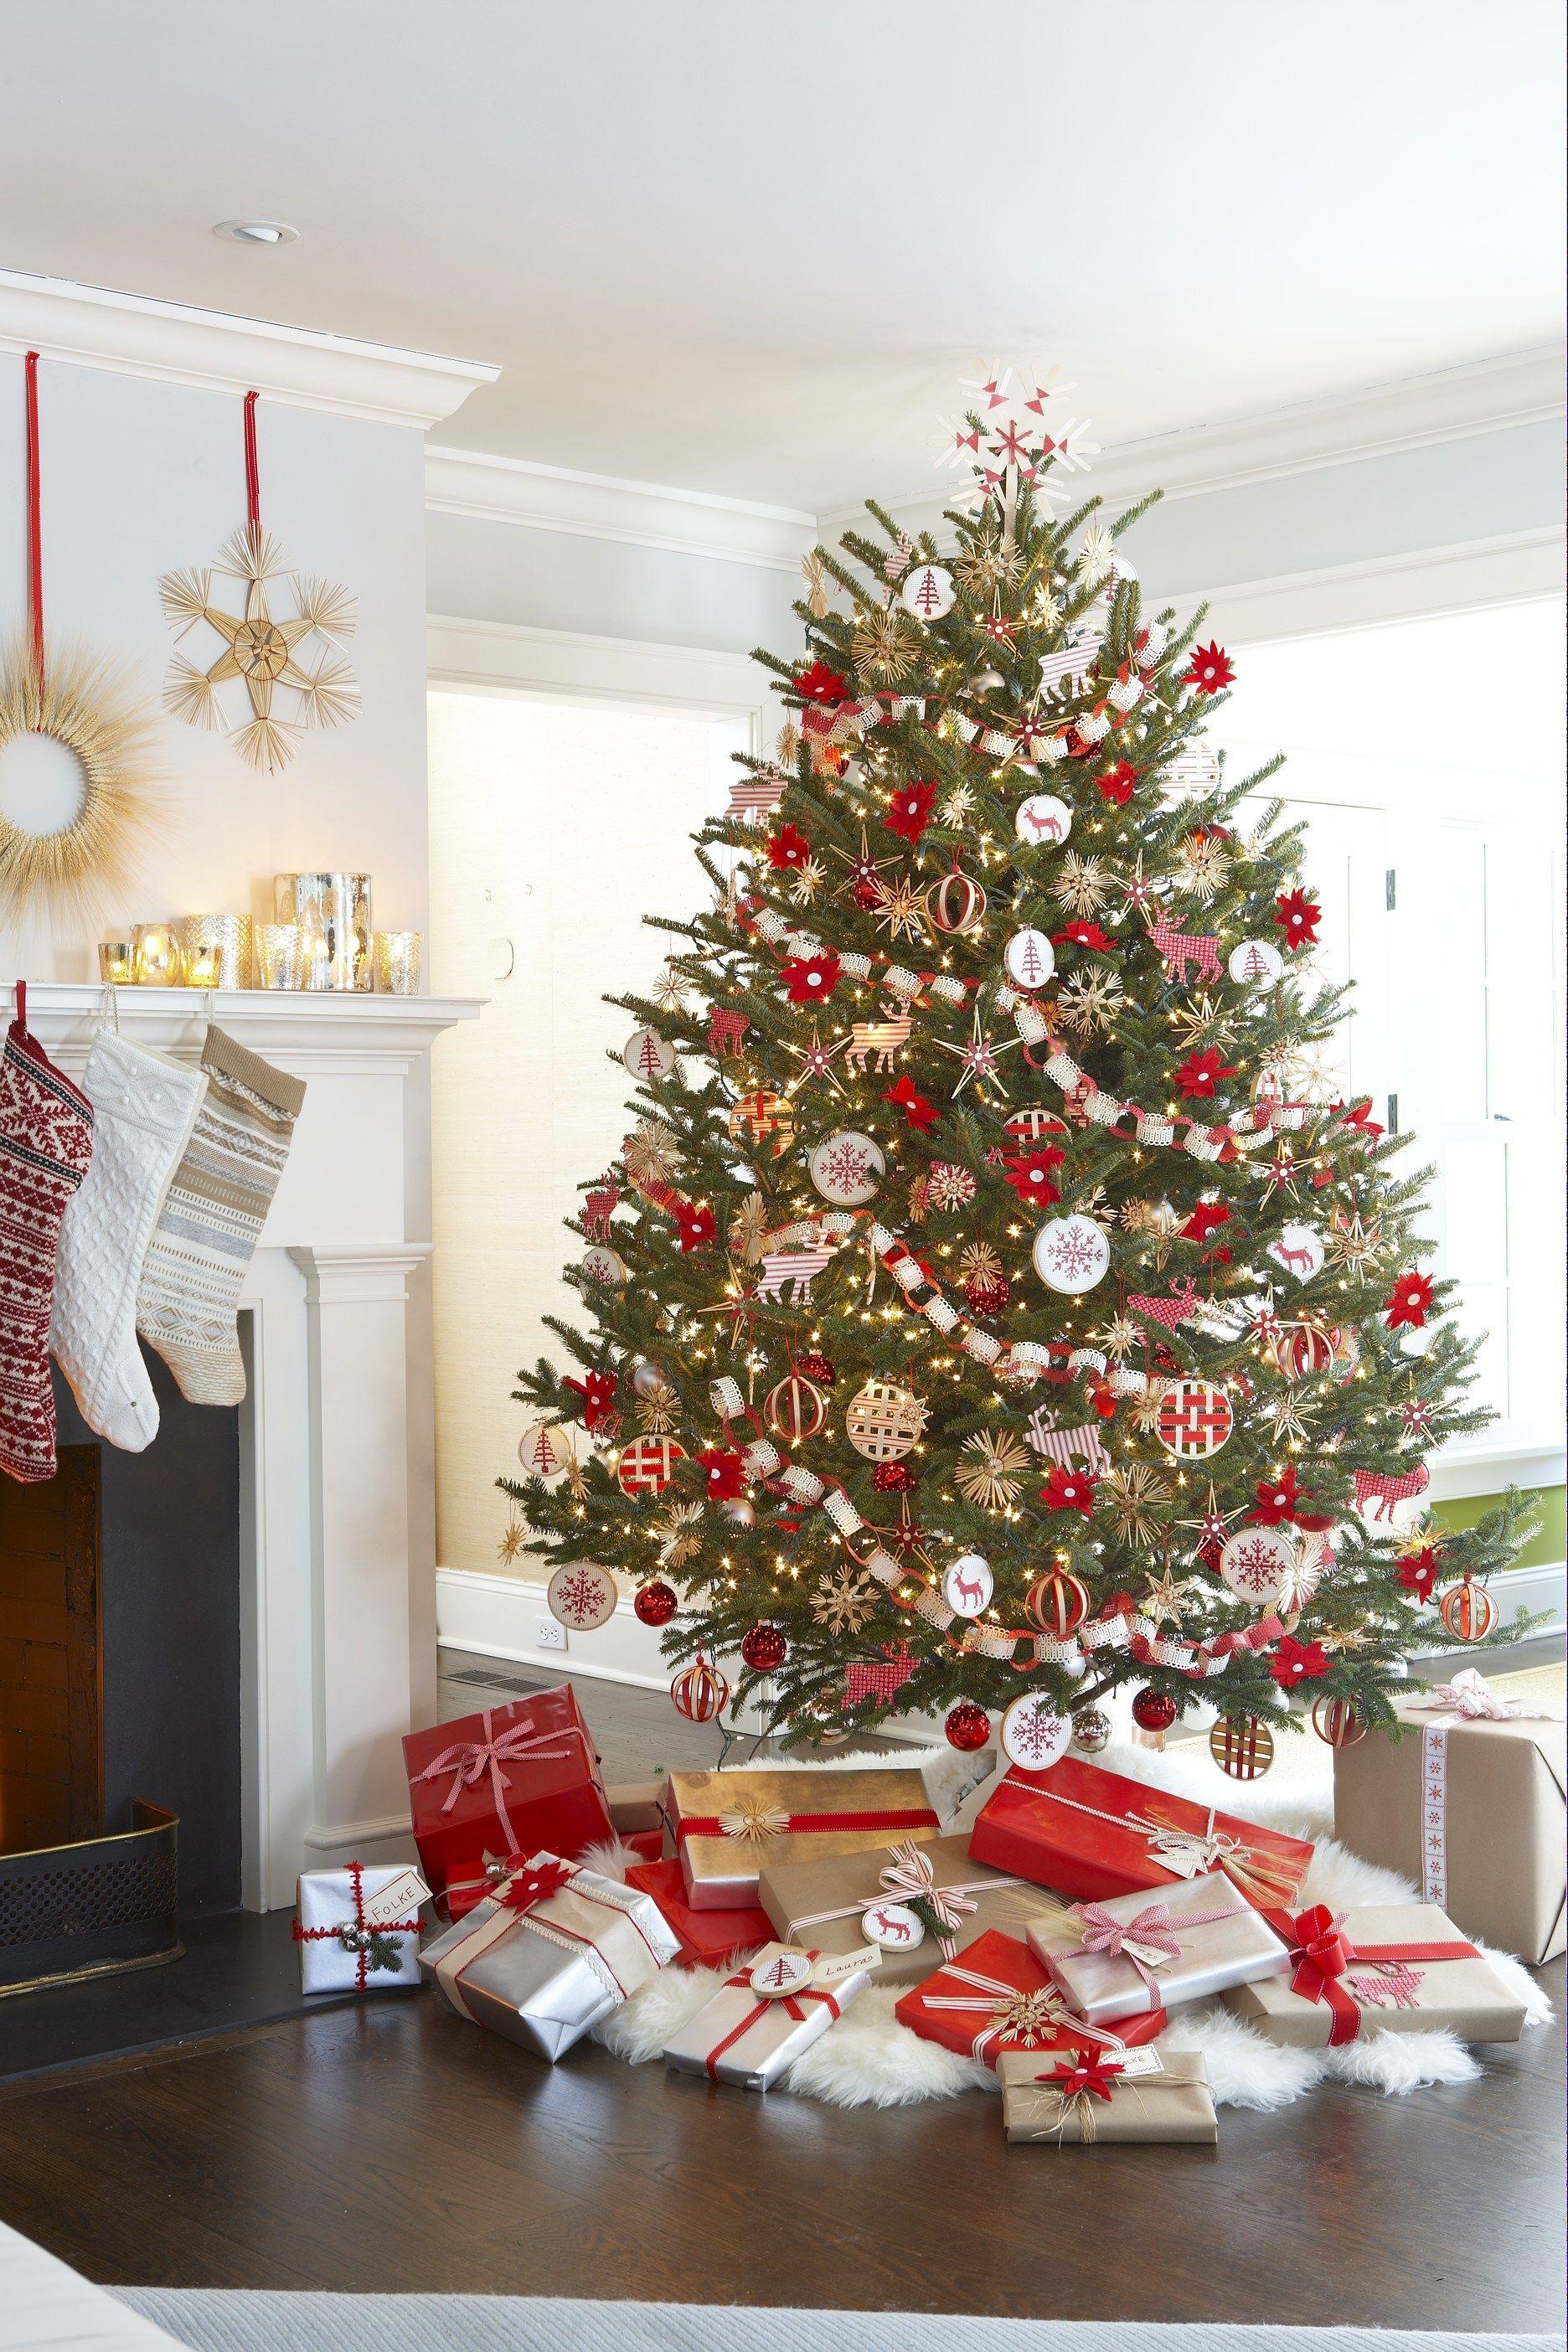 Pin By Artisans List On Love Love Love Christmas Traditional Christmas Decorations Traditional Christmas Tree Scandinavian Christmas Decorations